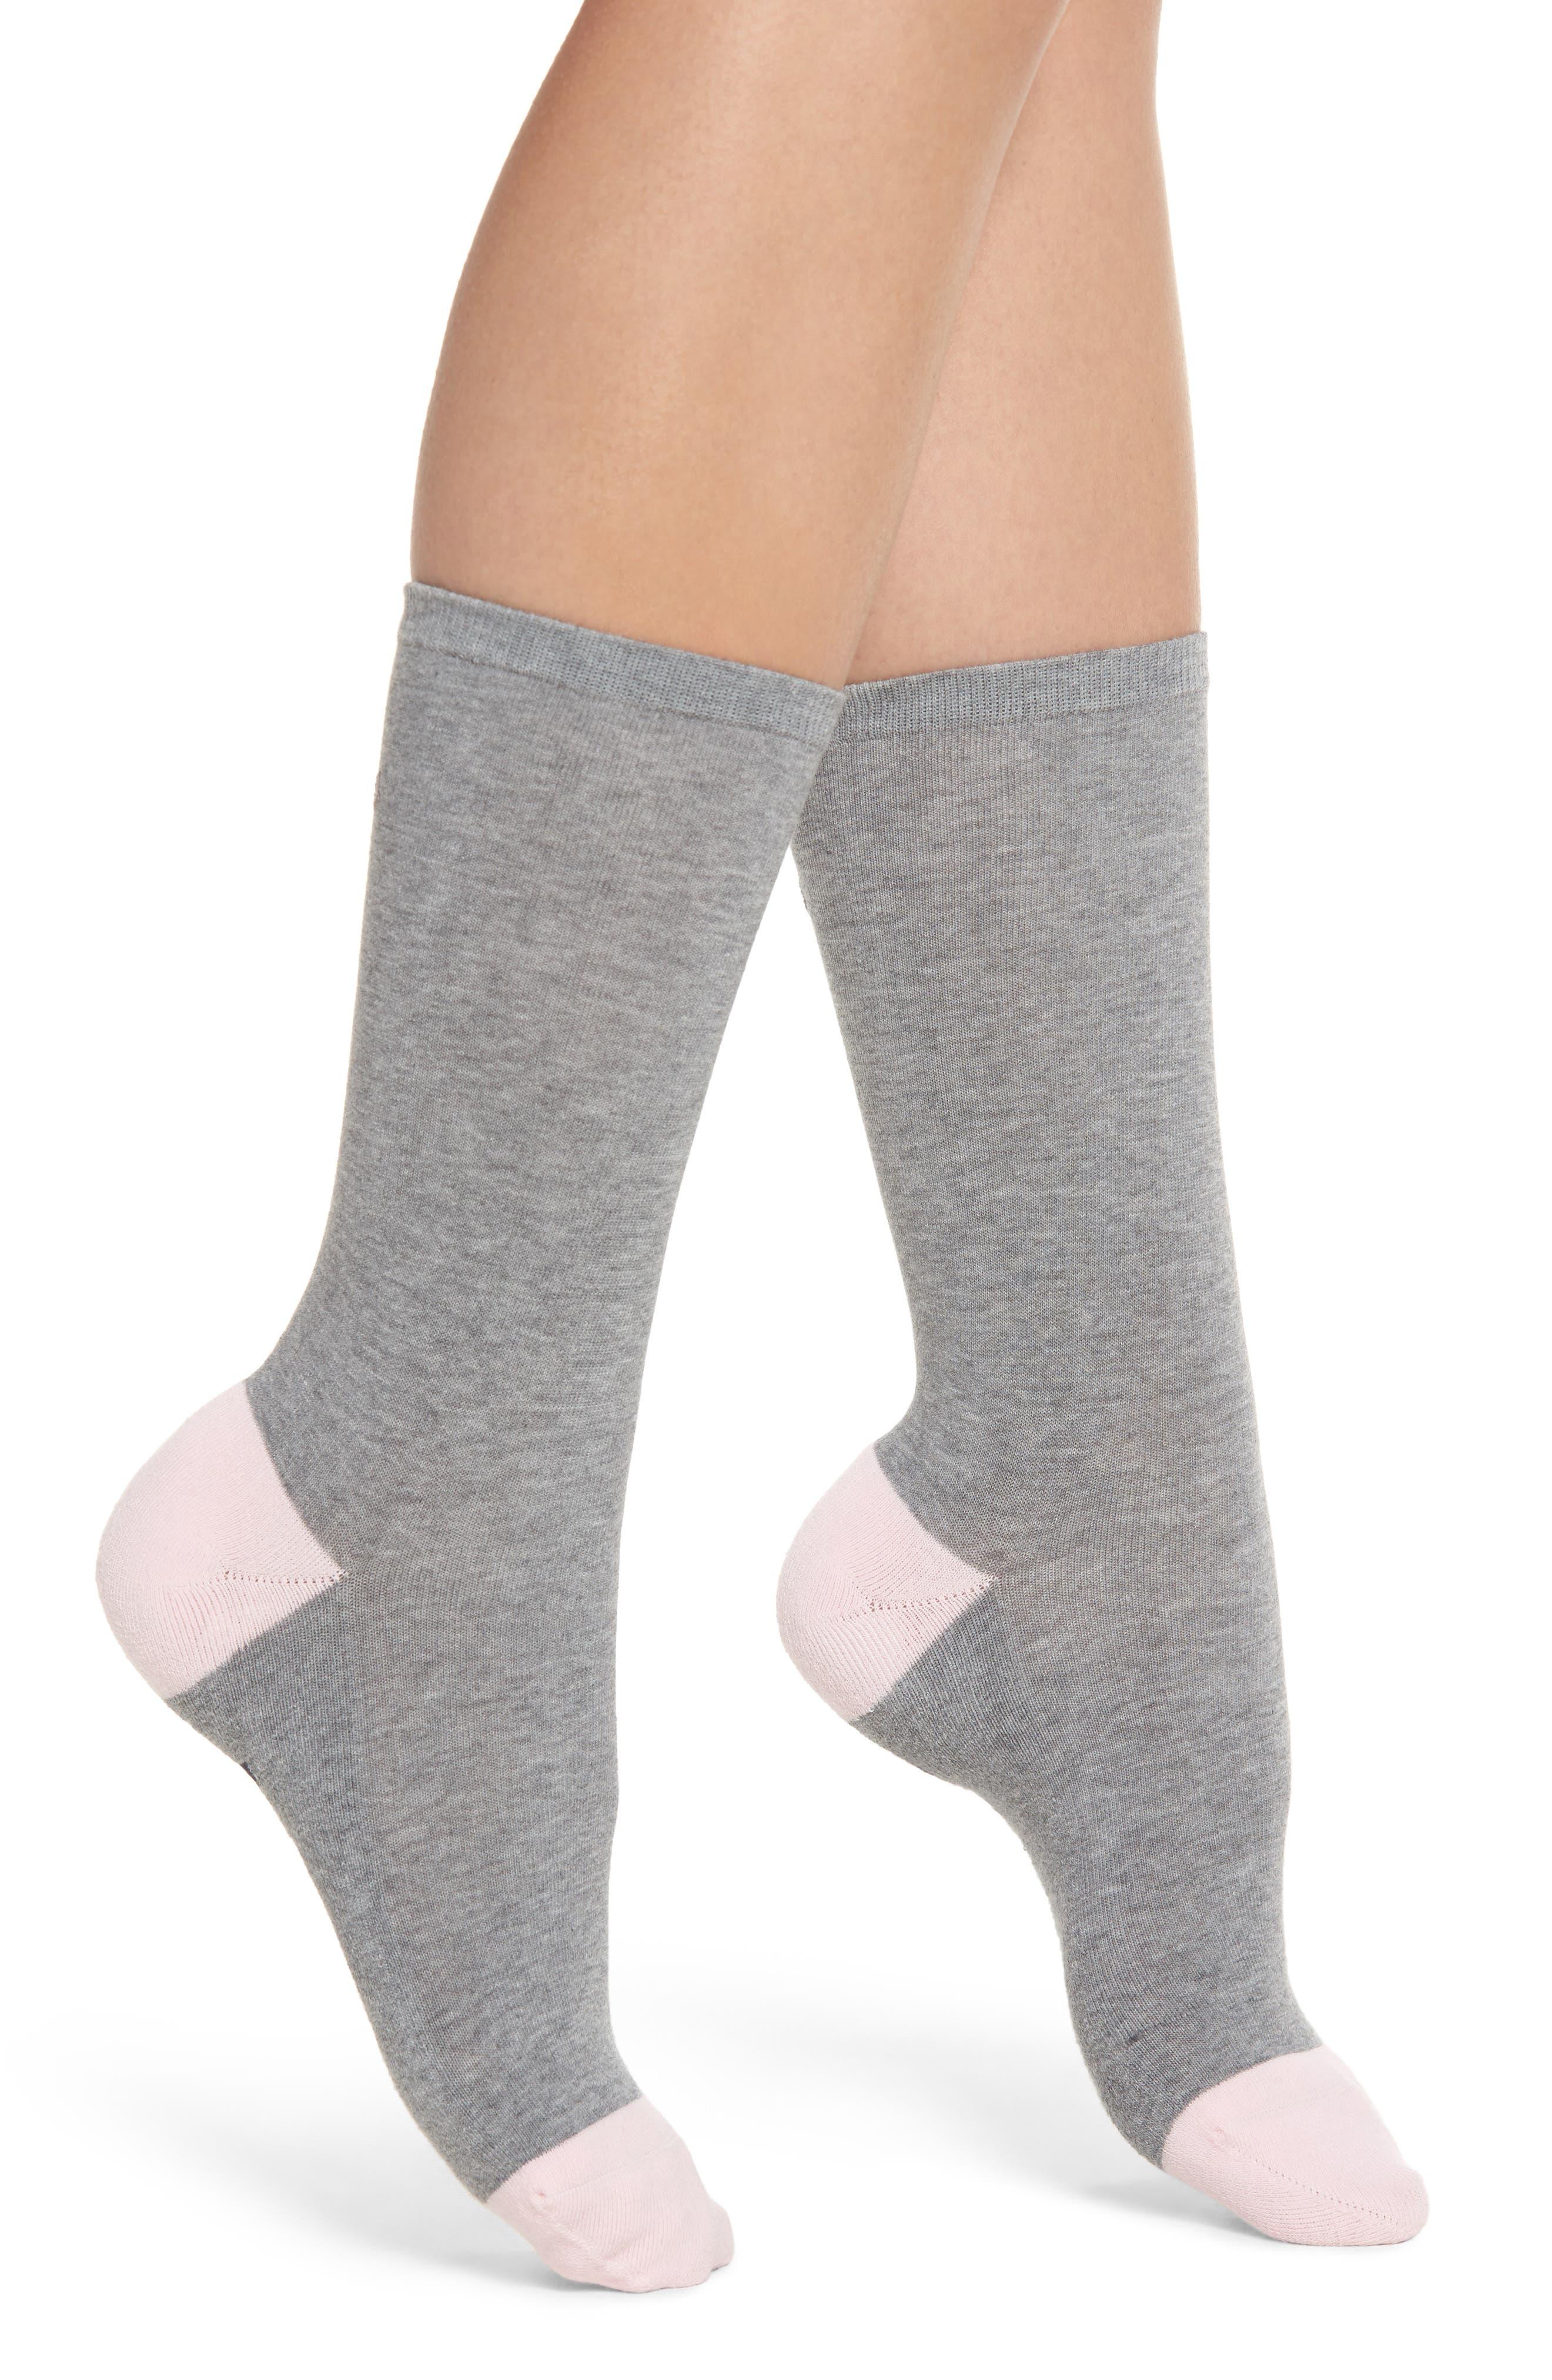 Foot Loose Crew Socks,                             Alternate thumbnail 2, color,                             Grey Heather